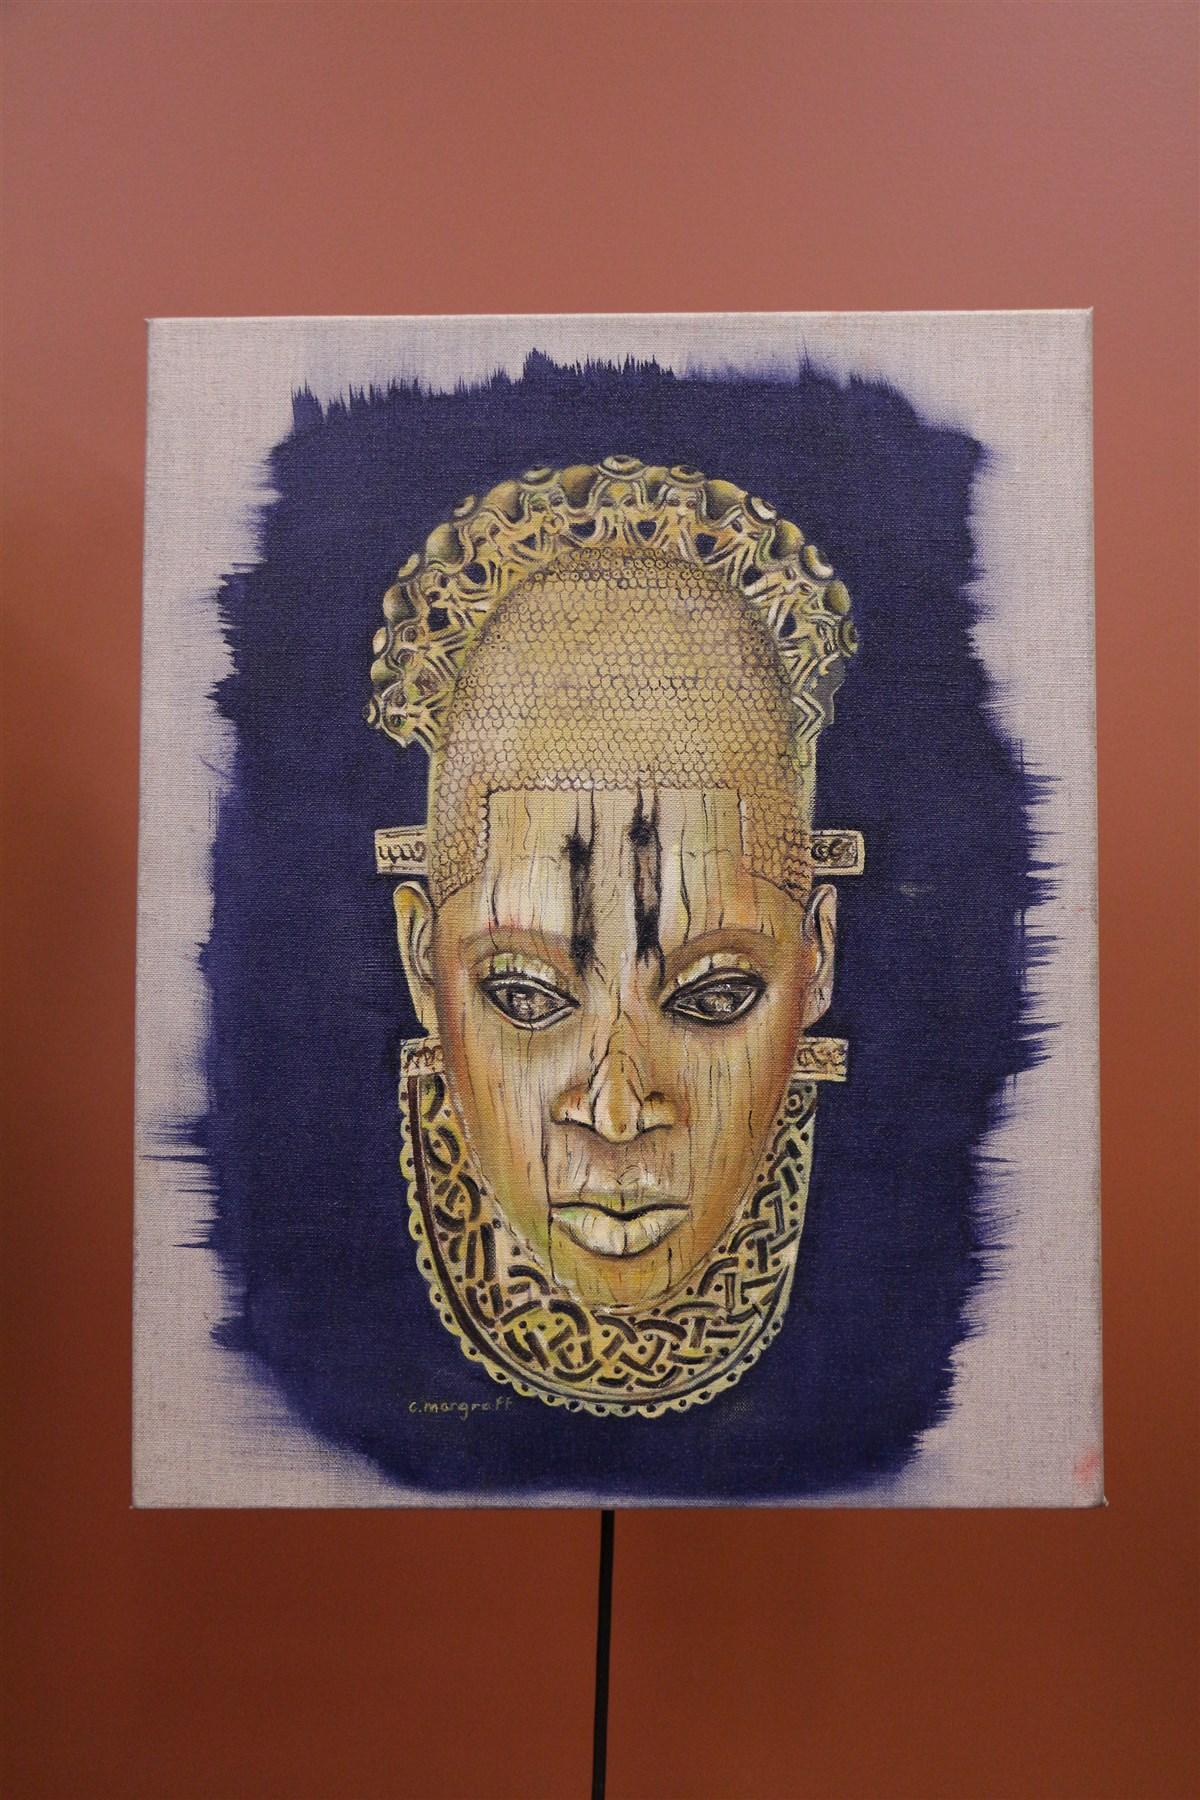 Huile sur toile d'inspiration art africain - Déco africaine - Art africain traditionnel